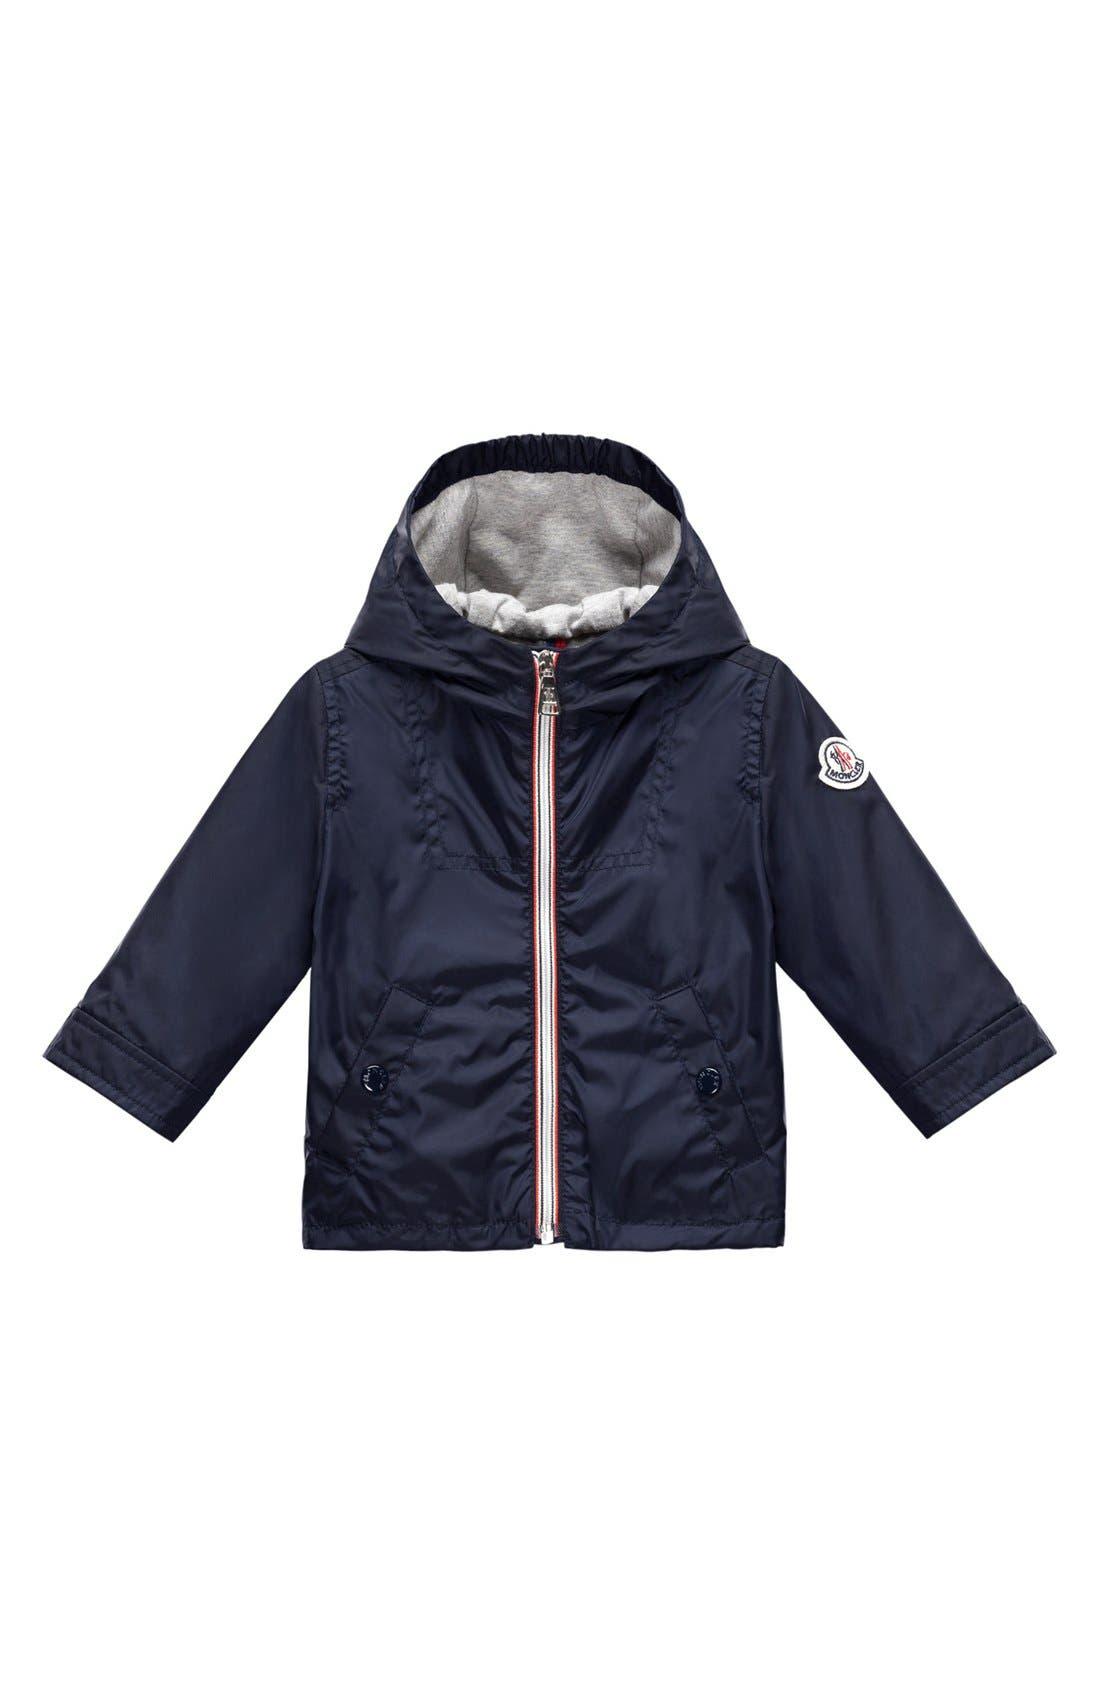 Main Image - Moncler Hooded Jacket (Baby Boys)